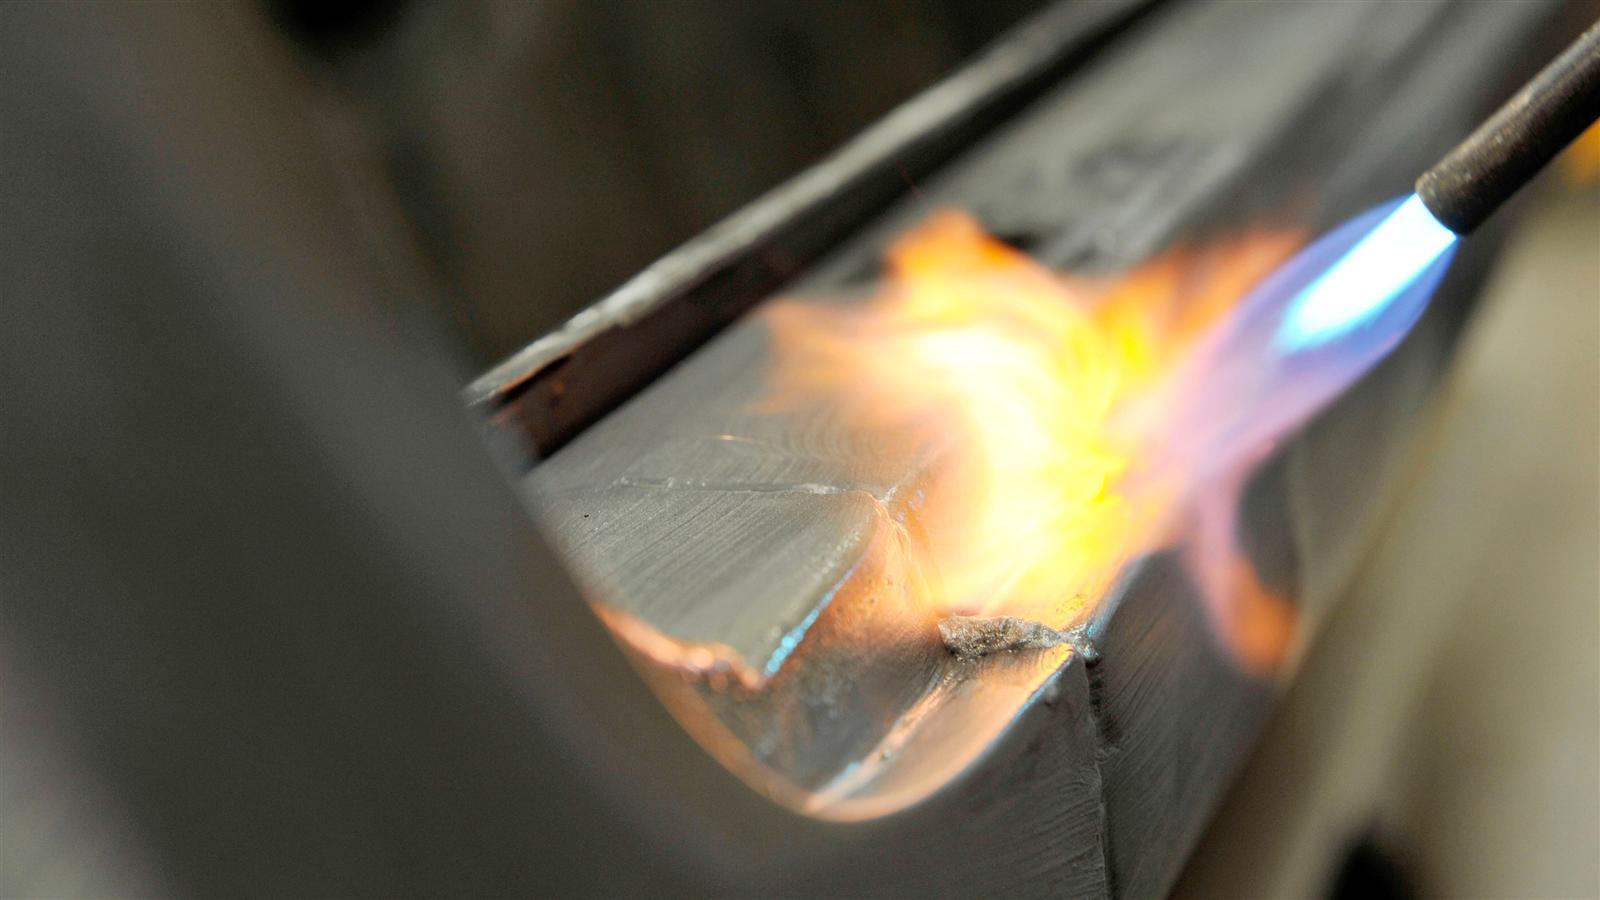 Porsche 911 Factory Restoration fire metal work